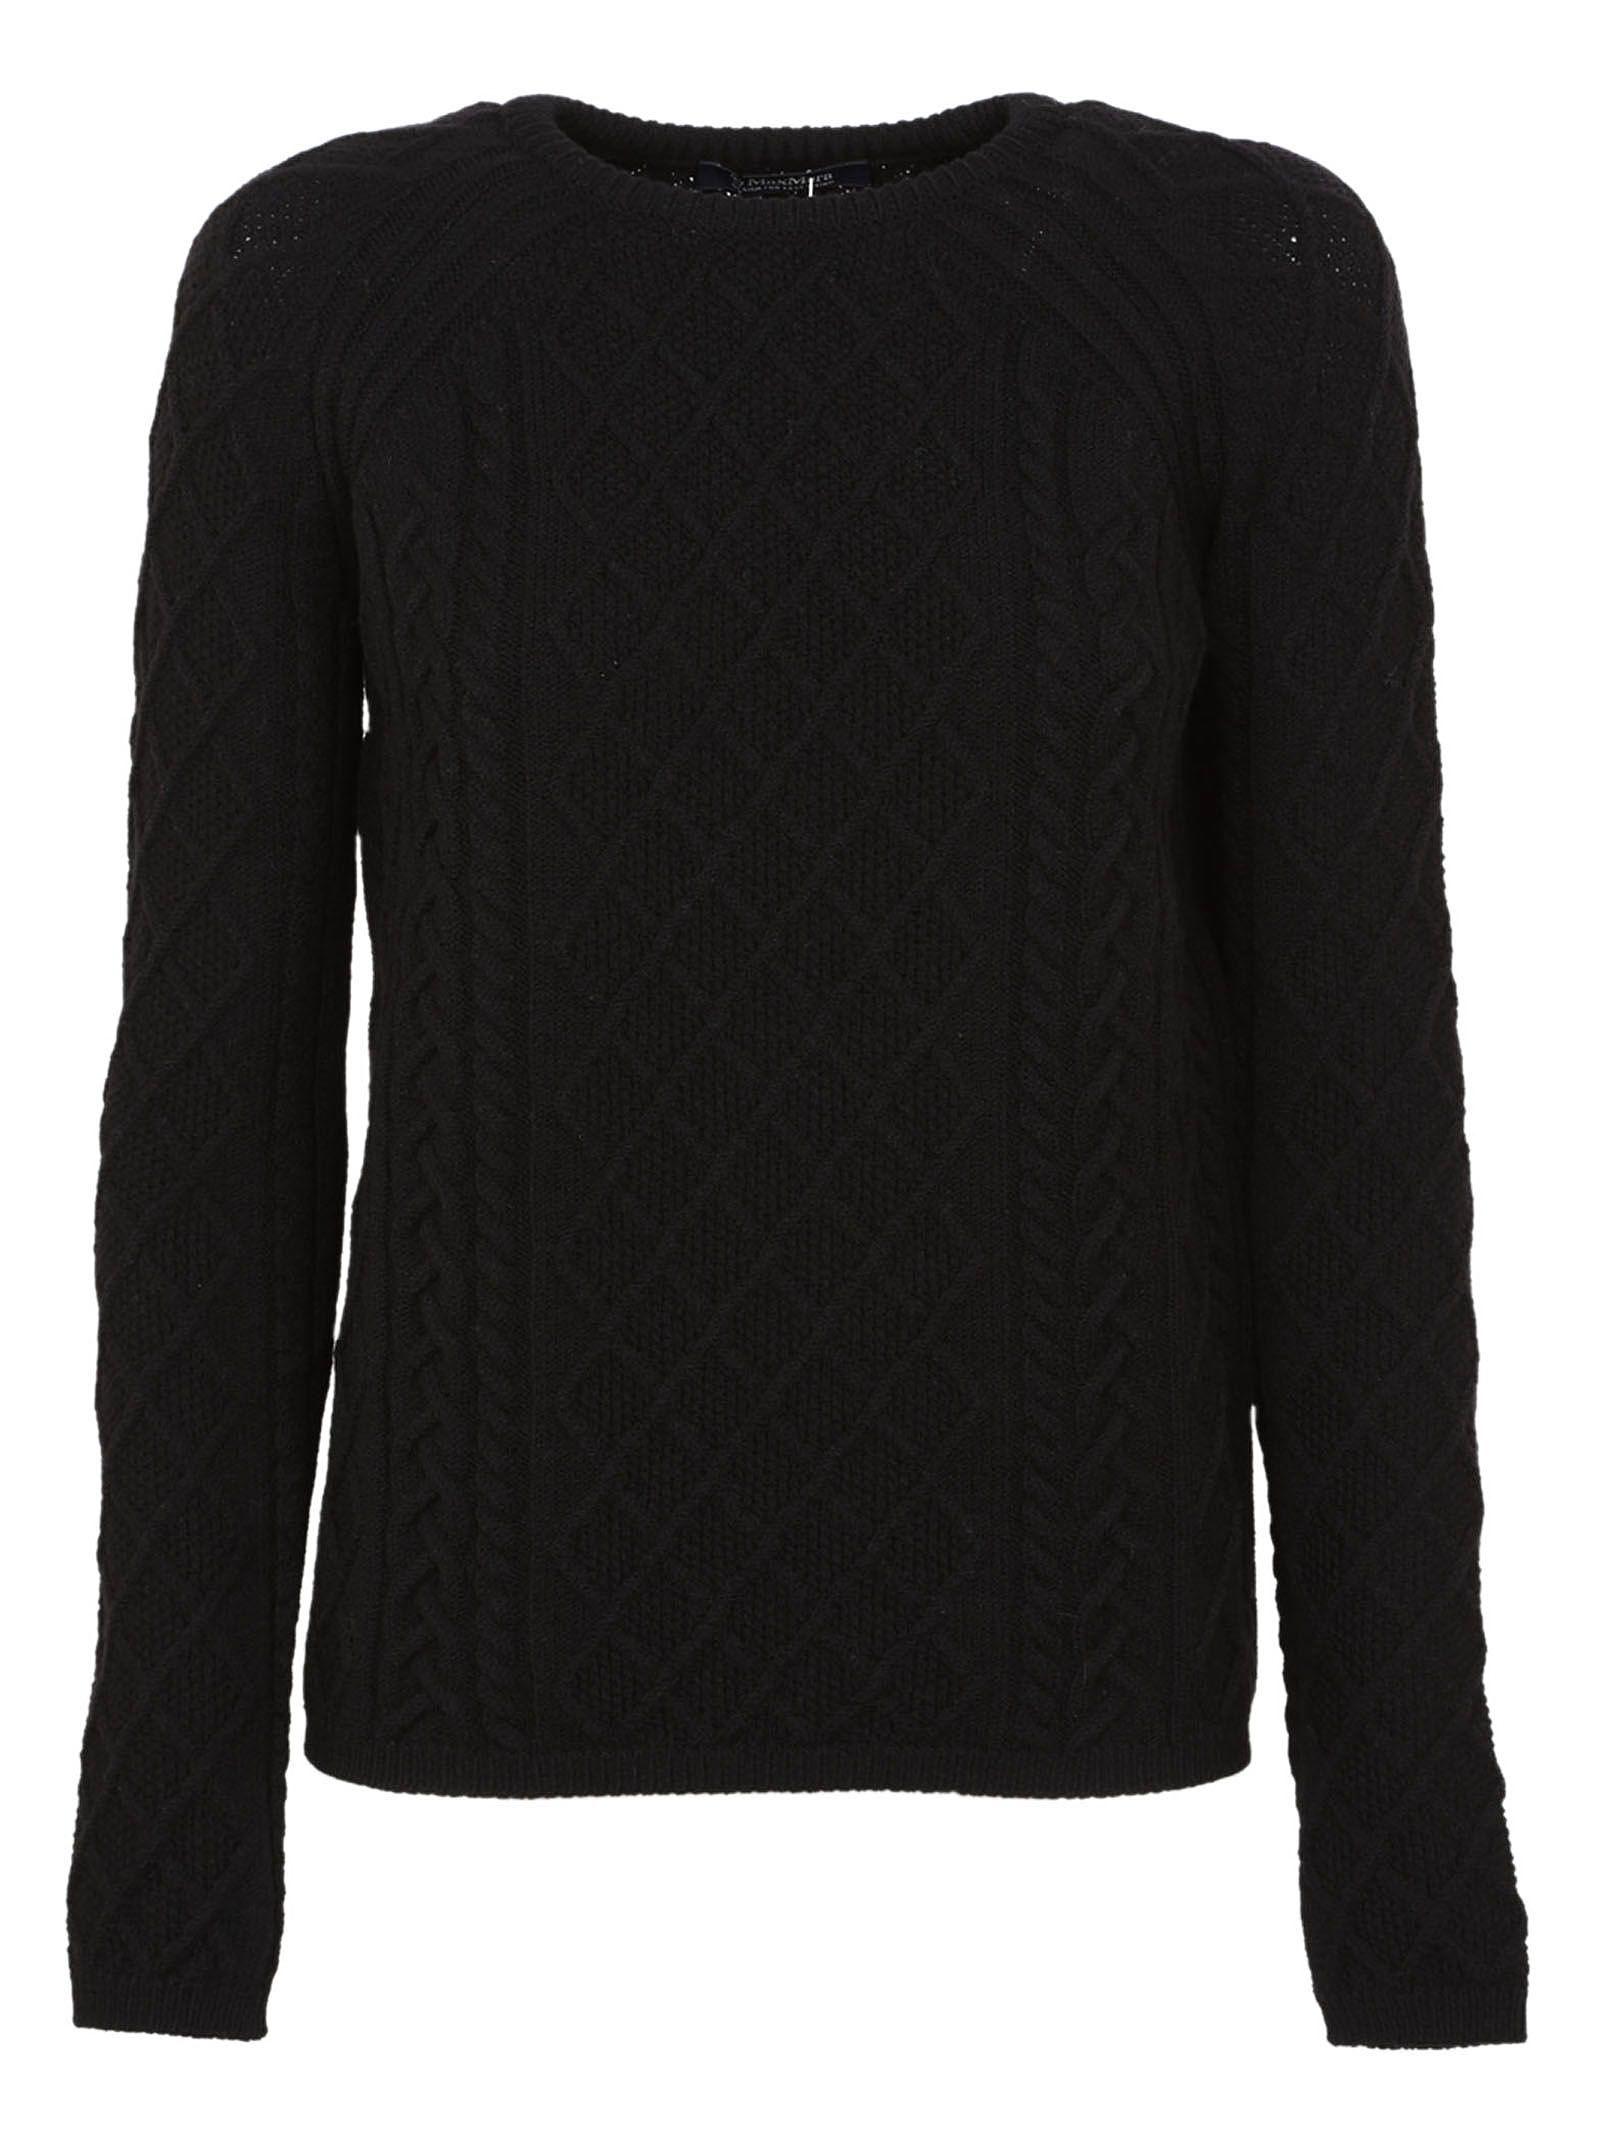 Max Mara Studio - S Max Mara Turbigo Cable Knit Sweater - Black ...